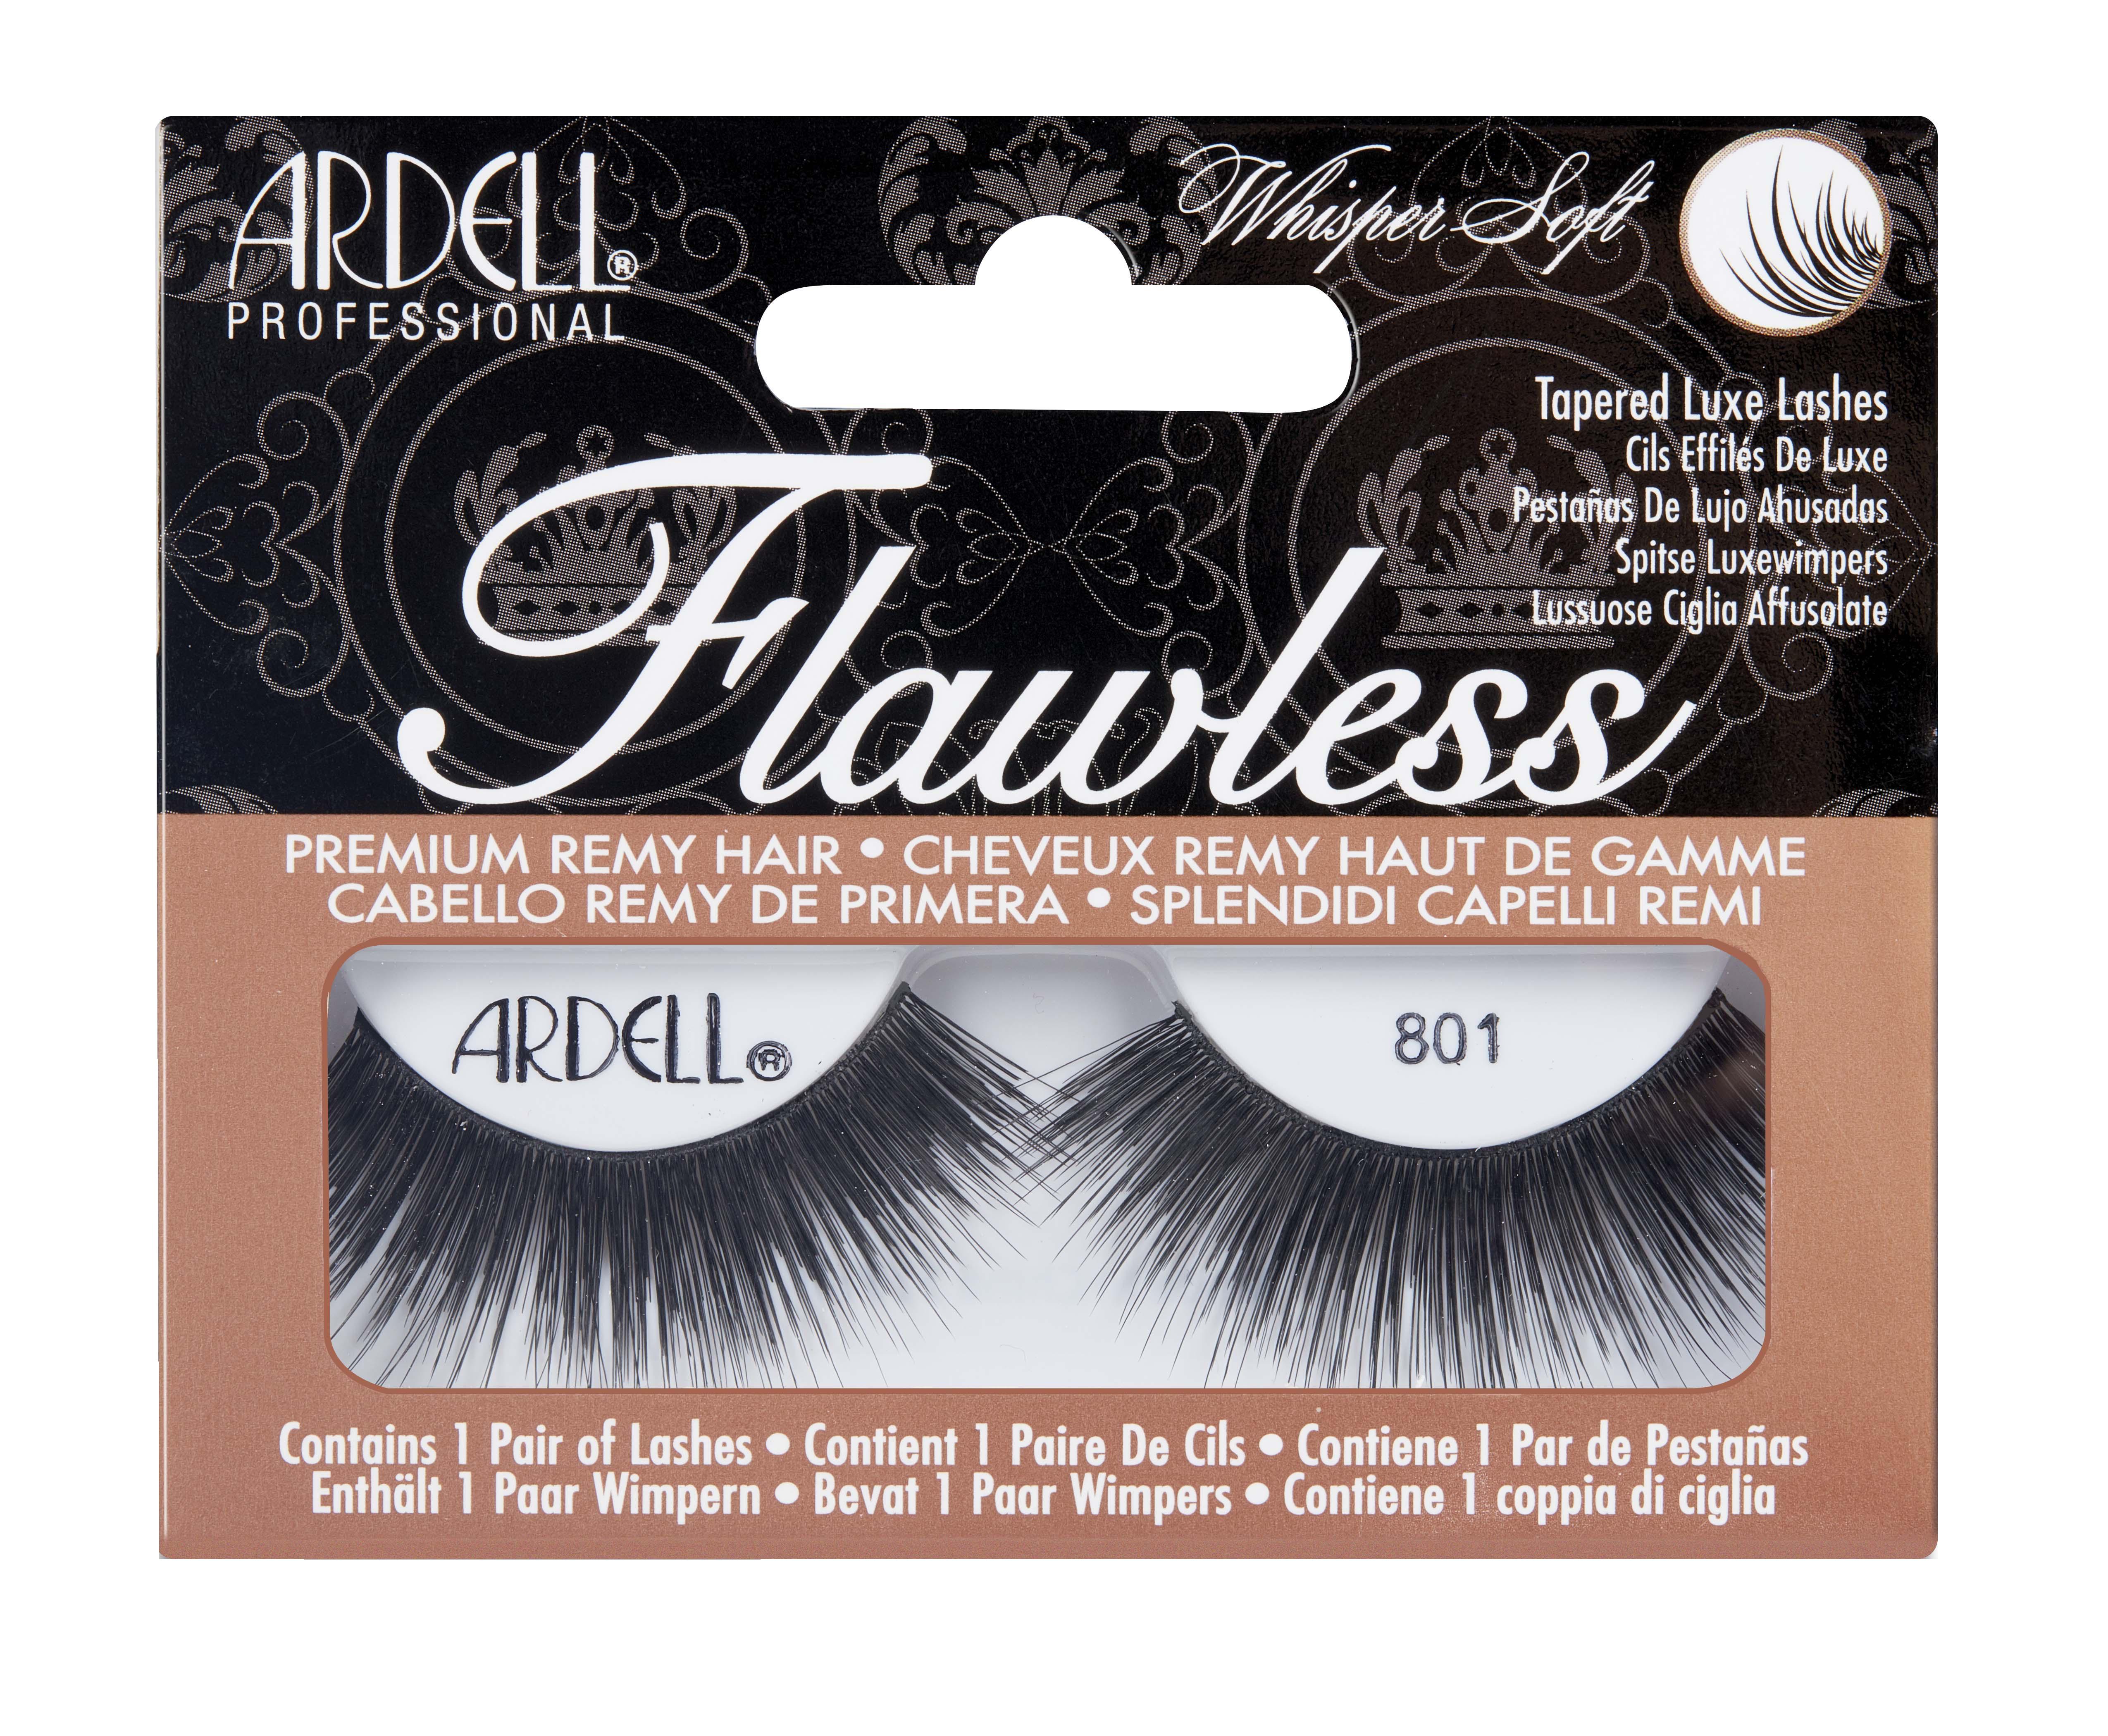 Flawless 801